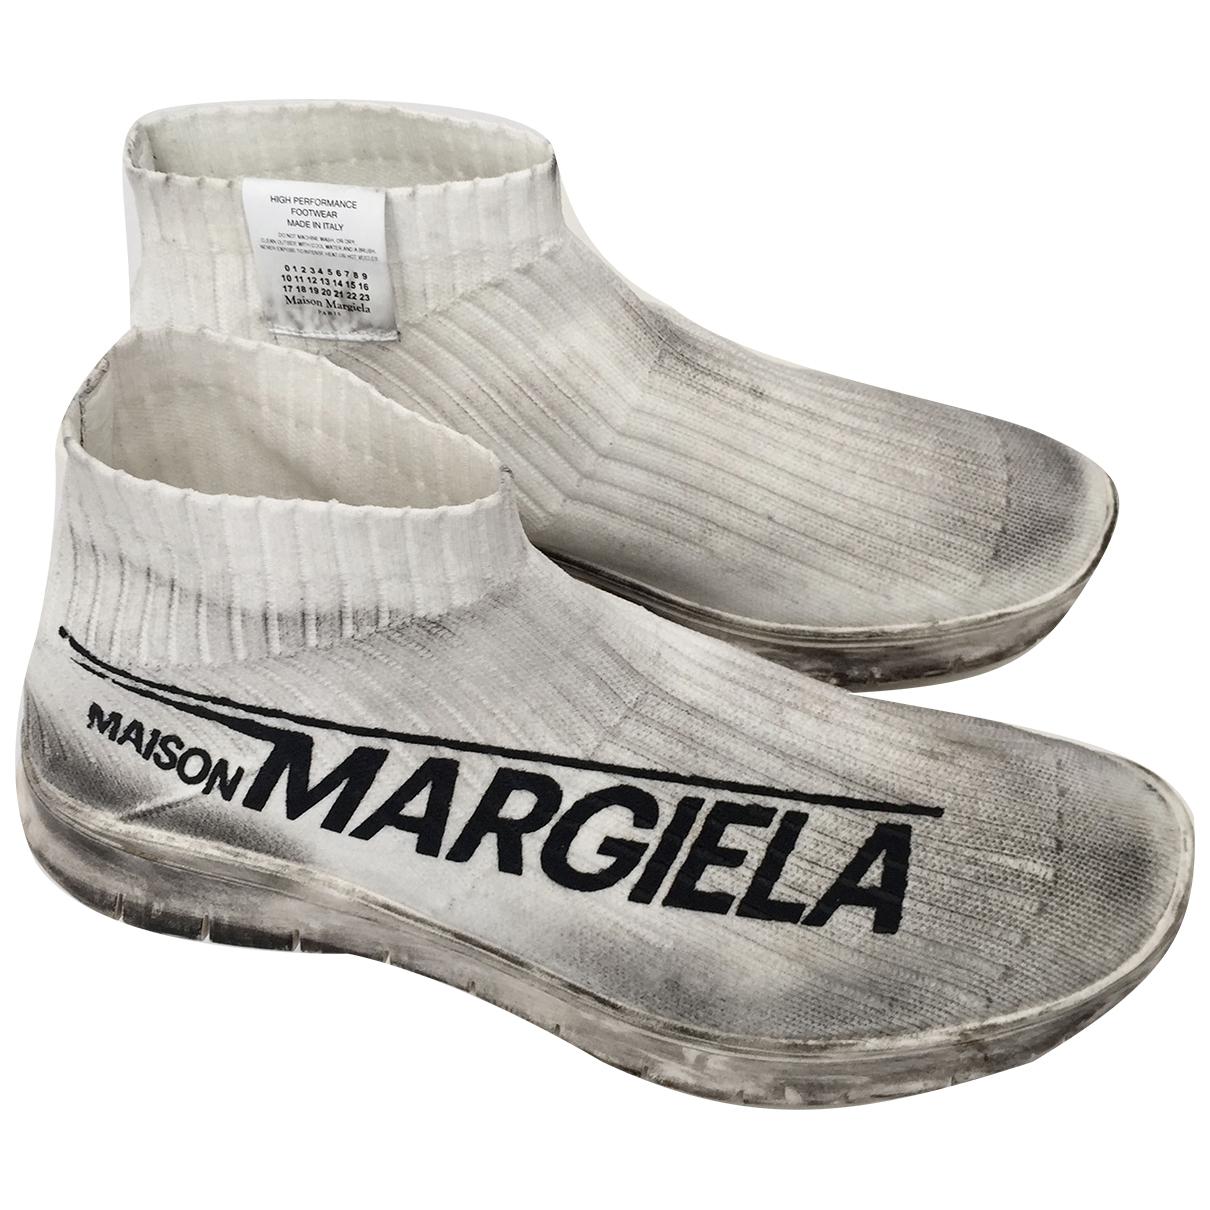 Deportivas de Lona Maison Martin Margiela